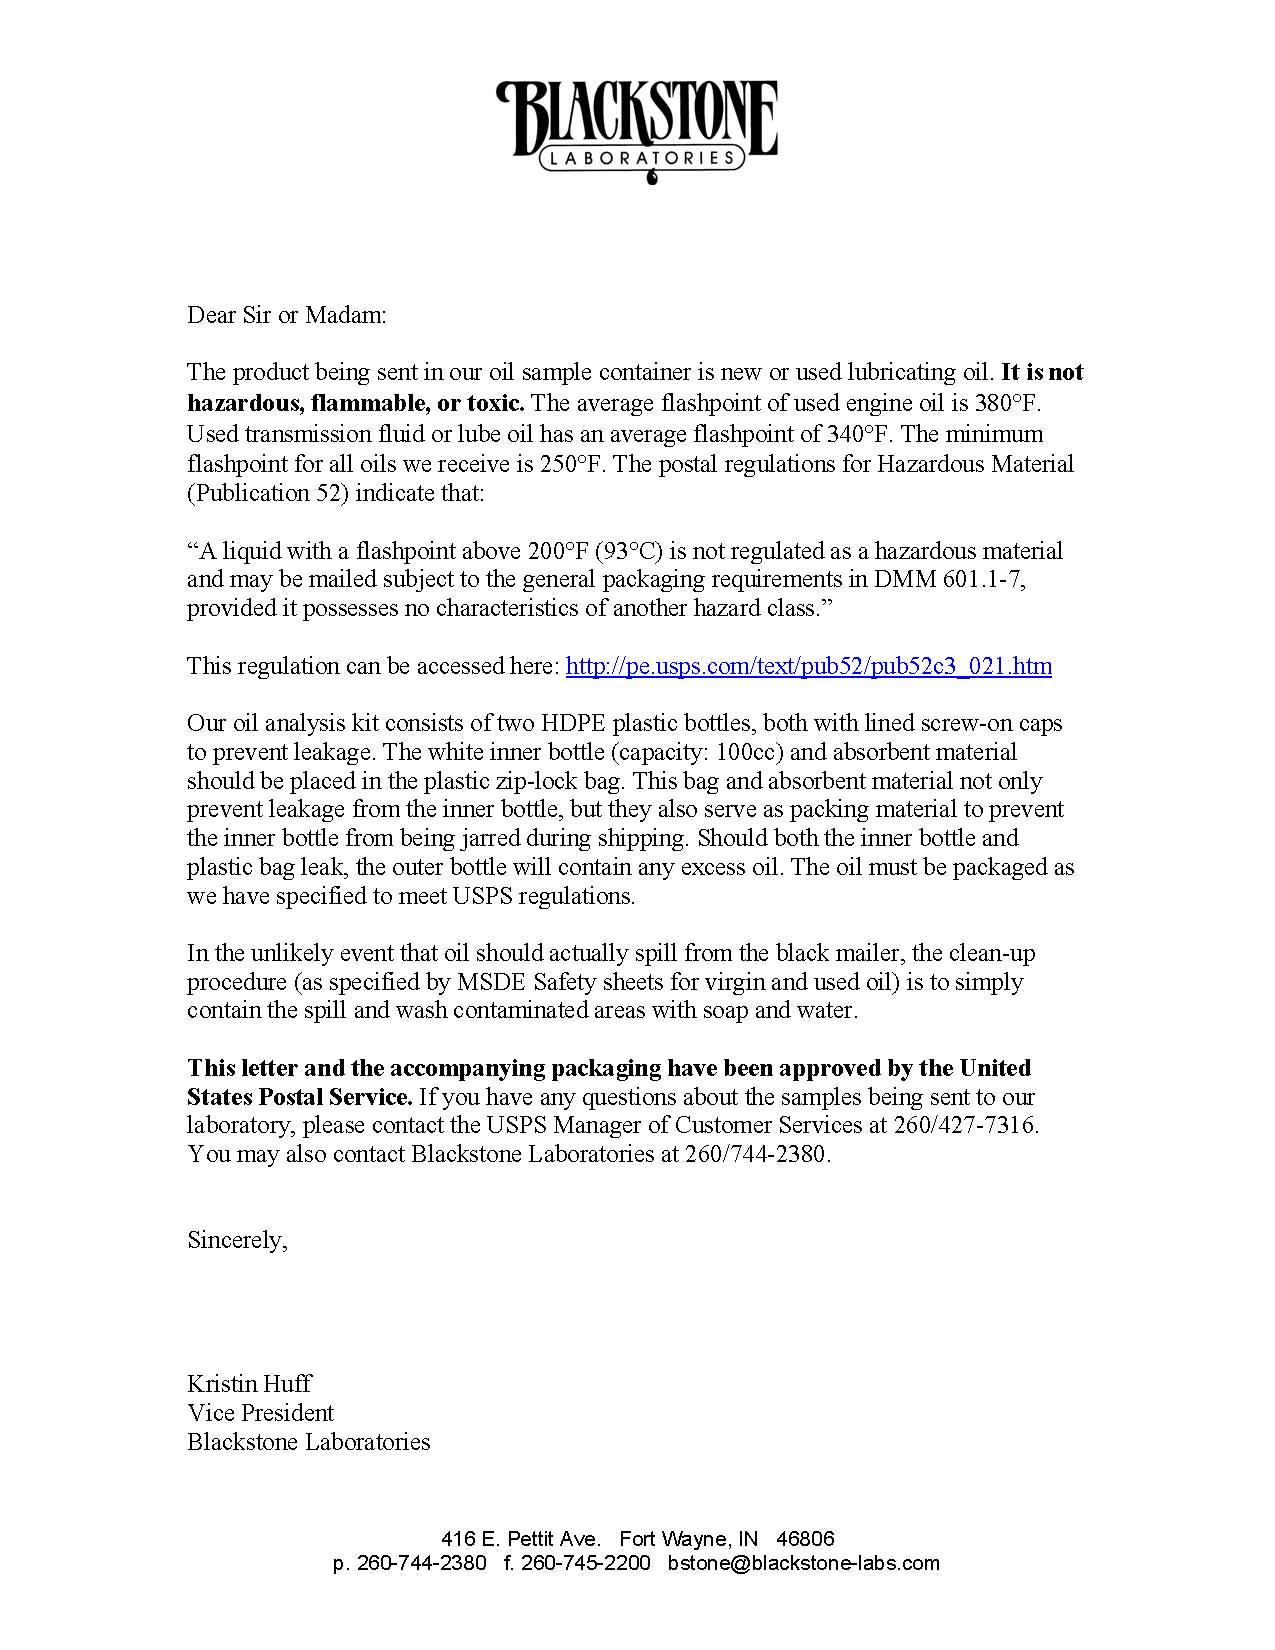 Postal Requirements | Blackstone Laboratories